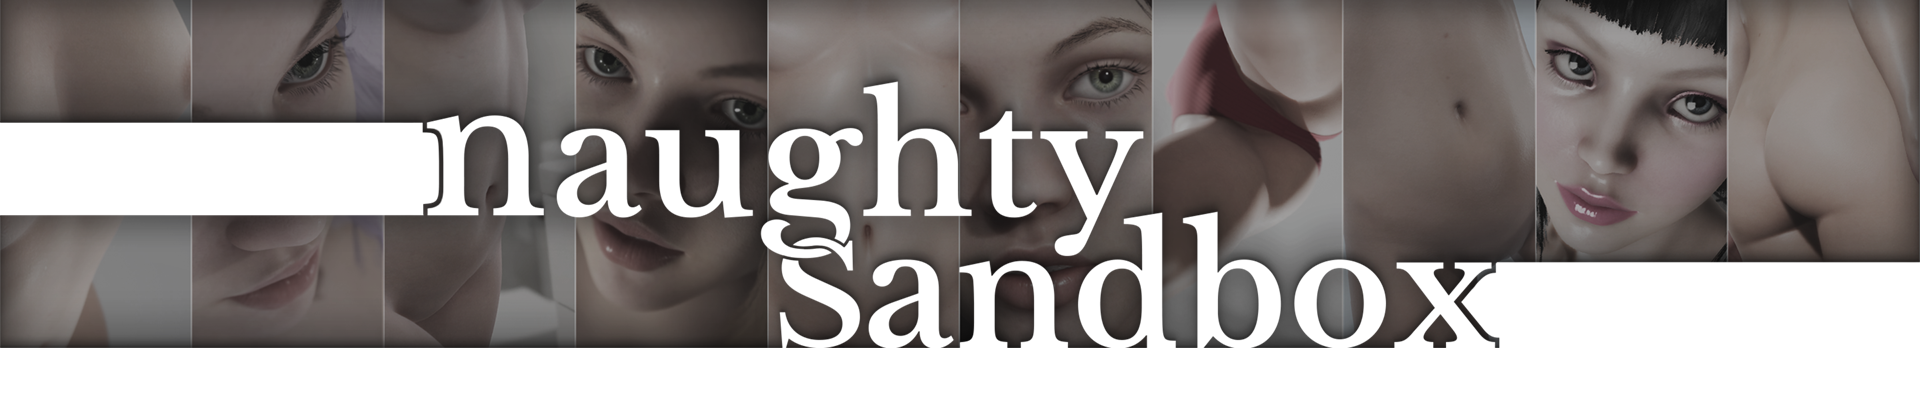 Naughty Sandbox [DLC]: Russian Apartment